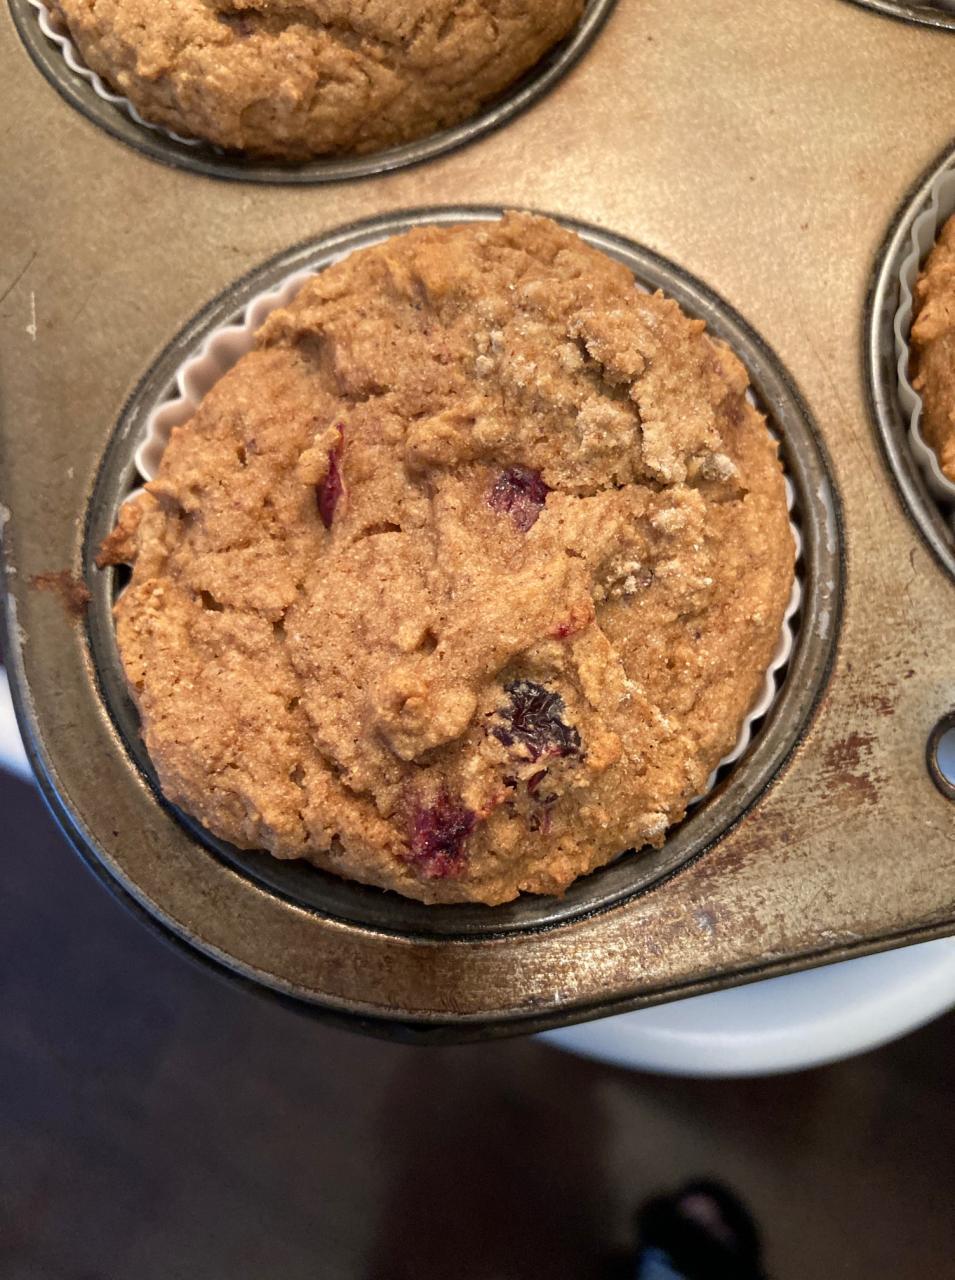 Cranberry Orange Muffins (Vegan and Gluten-free)